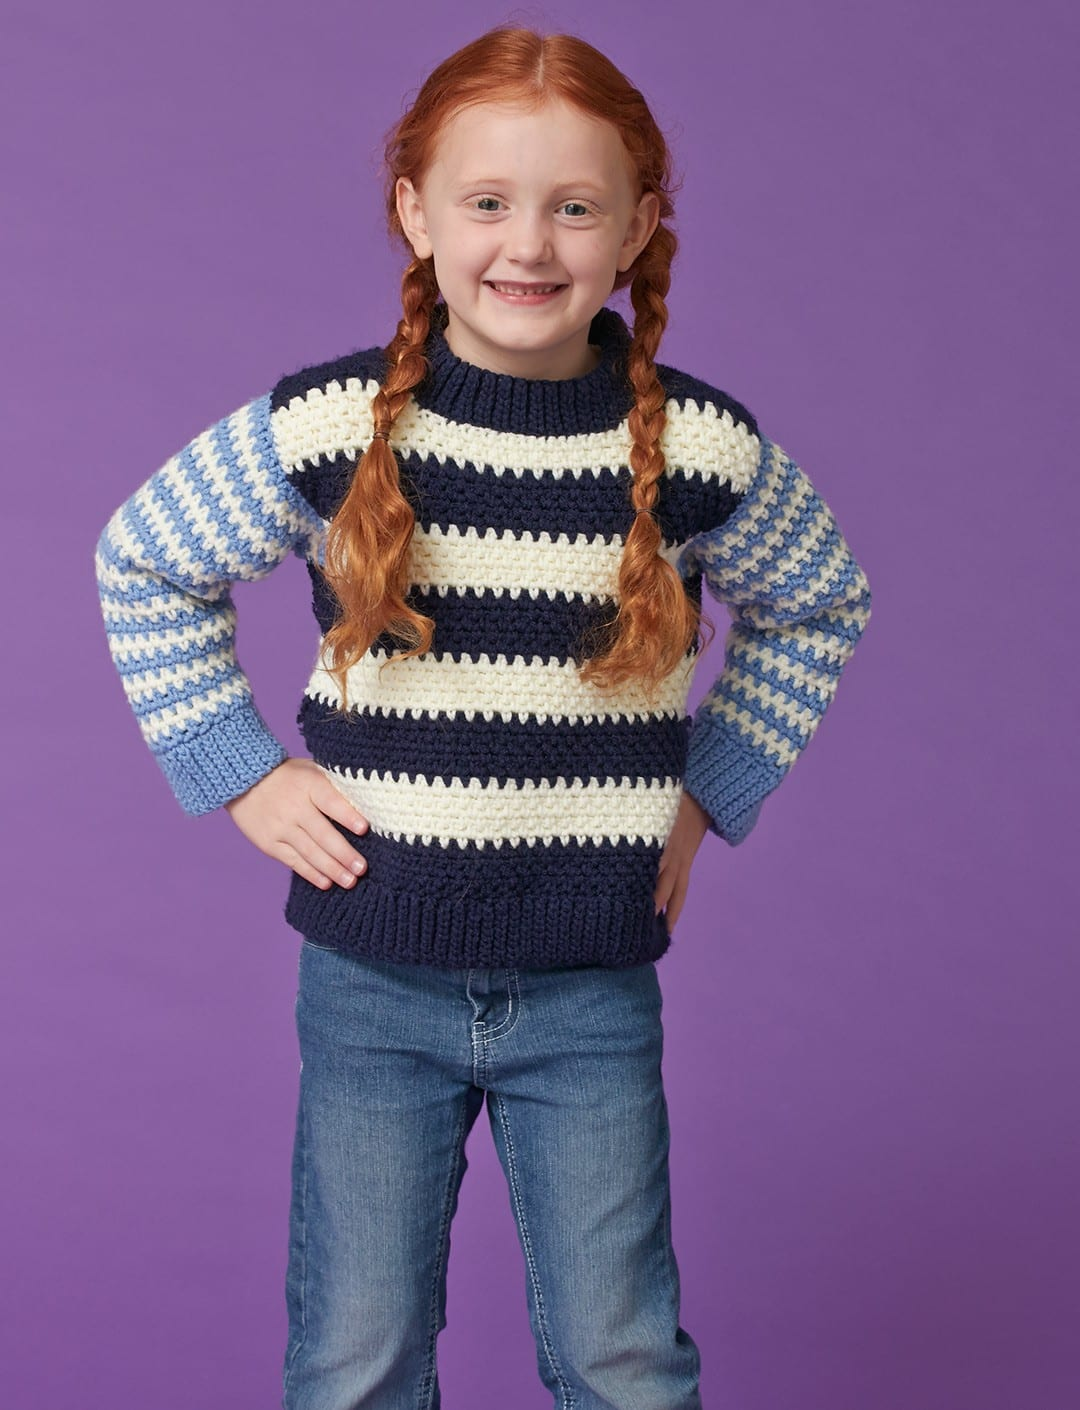 Kids Crochet Patterns That Look Knit Sewrella